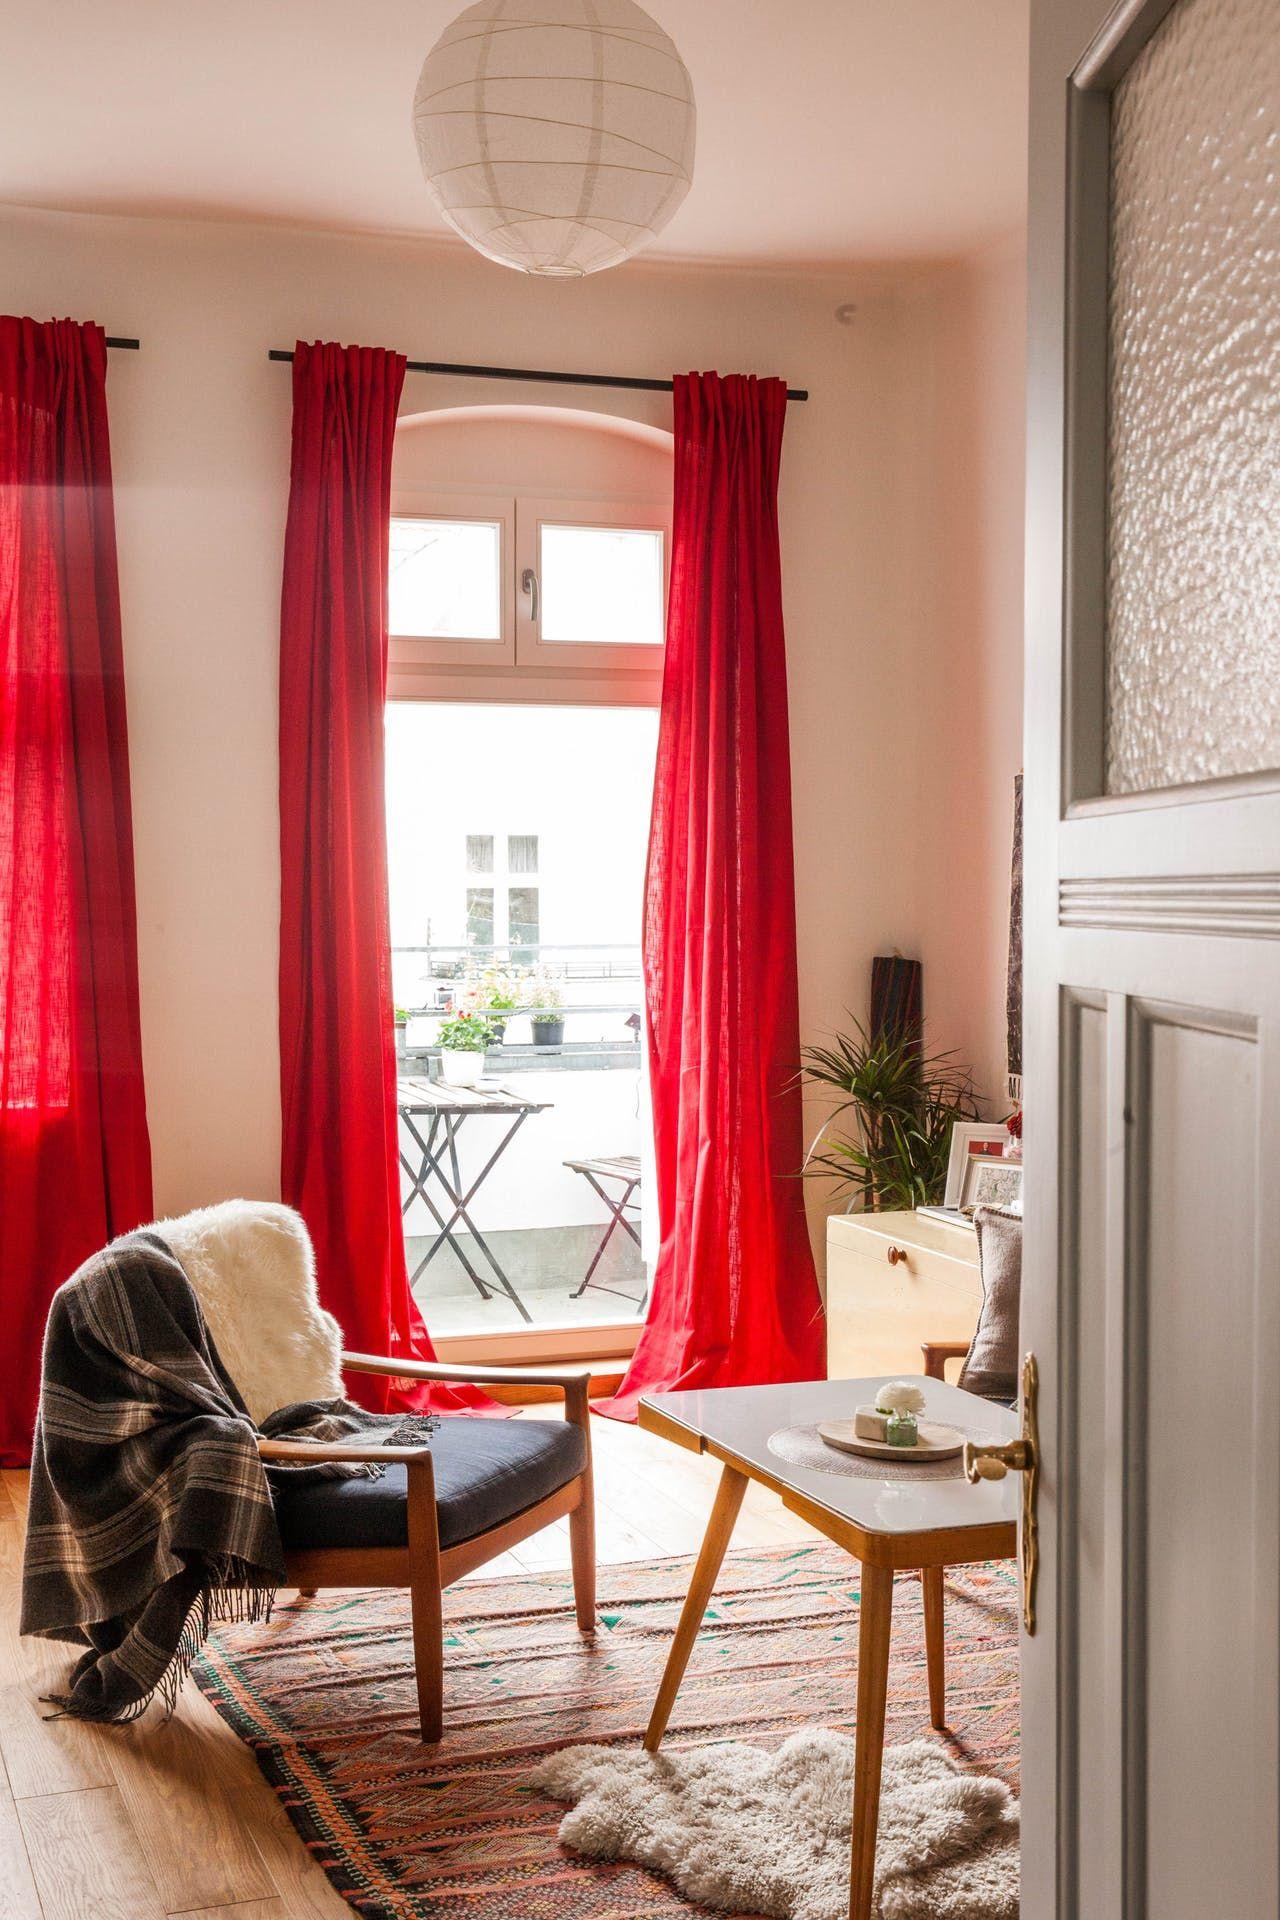 a french meets west coast creative berlin apartment berlin apartmentapartment therapyroommateshome interiorsbathroom subway tilessquare